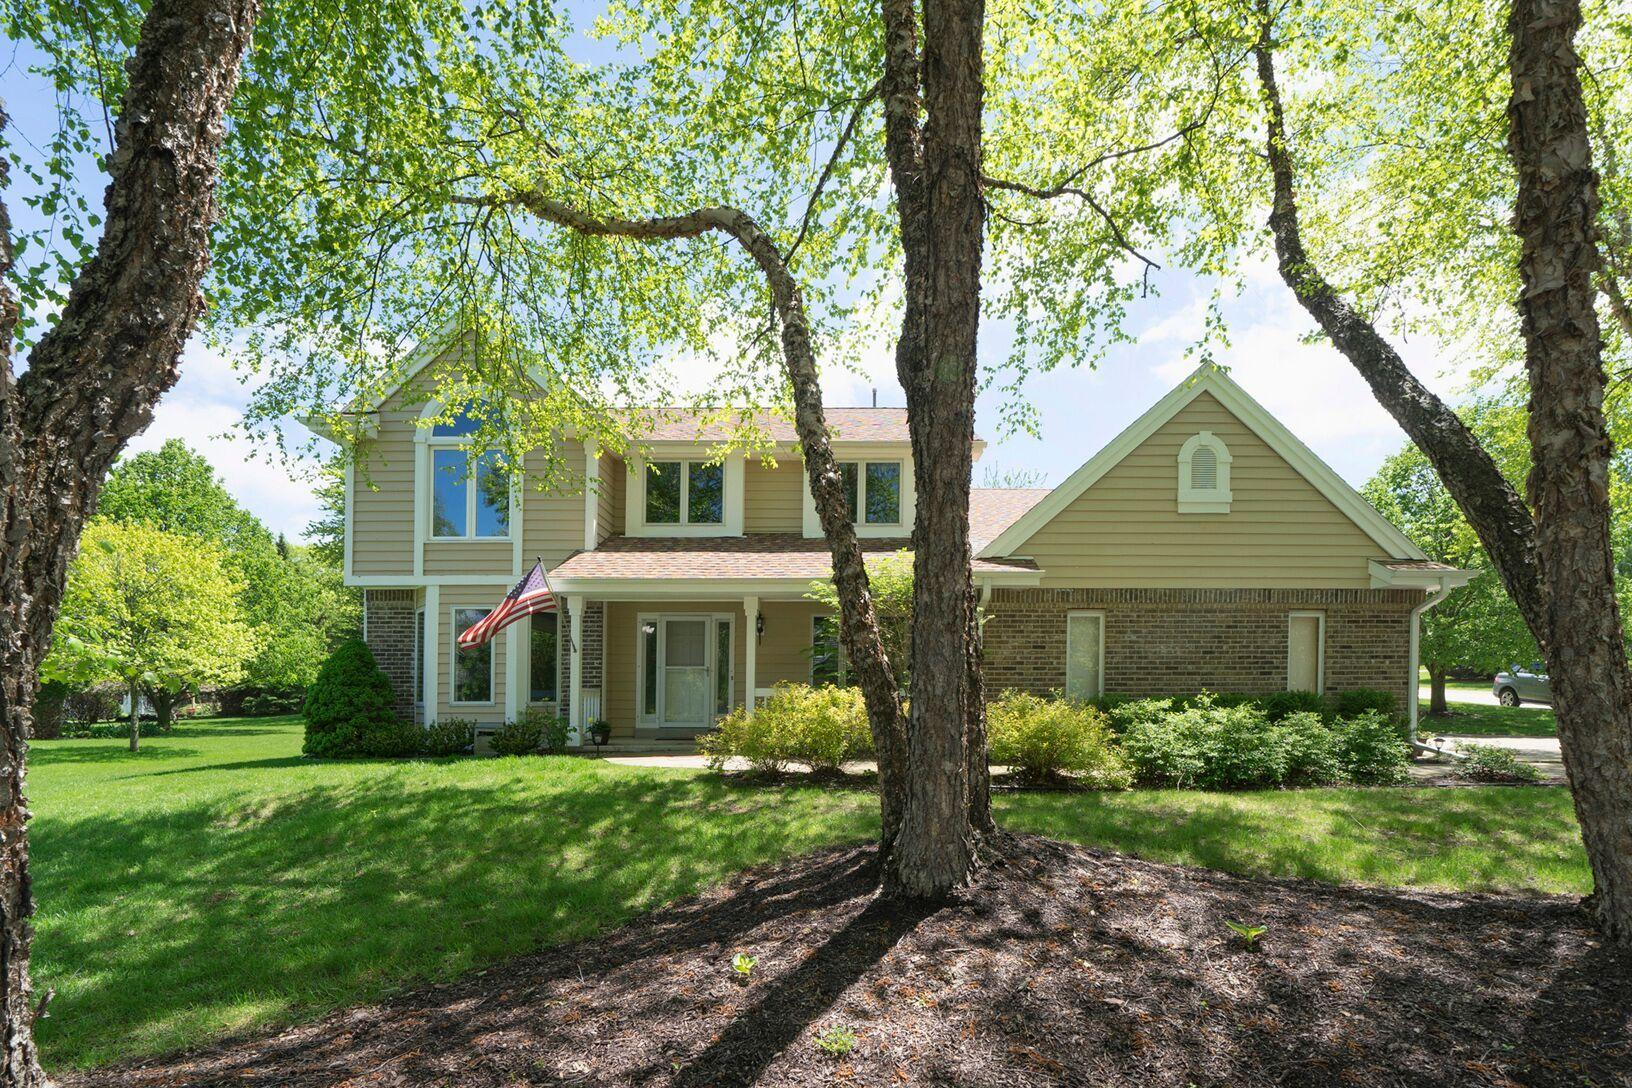 W275N2682 Wildflower Rd, Pewaukee, Wisconsin 53072, 4 Bedrooms Bedrooms, 10 Rooms Rooms,2 BathroomsBathrooms,Single-Family,For Sale,Wildflower Rd,1639081